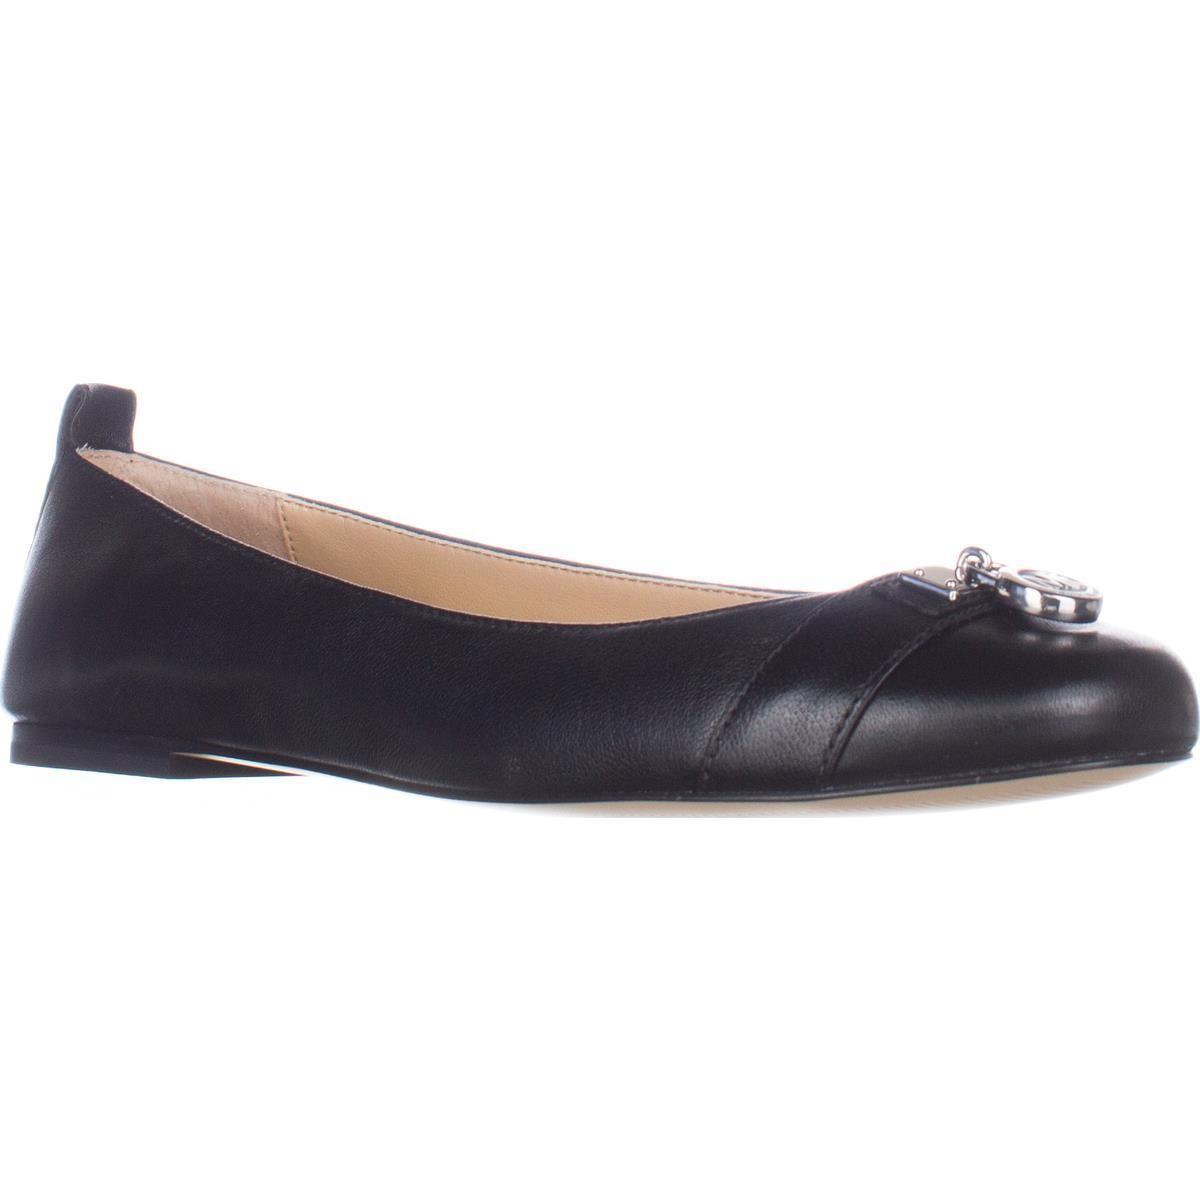 322f95cd2f9 Lyst - Michael Kors Michael Hamilton Ballet Flats in Black